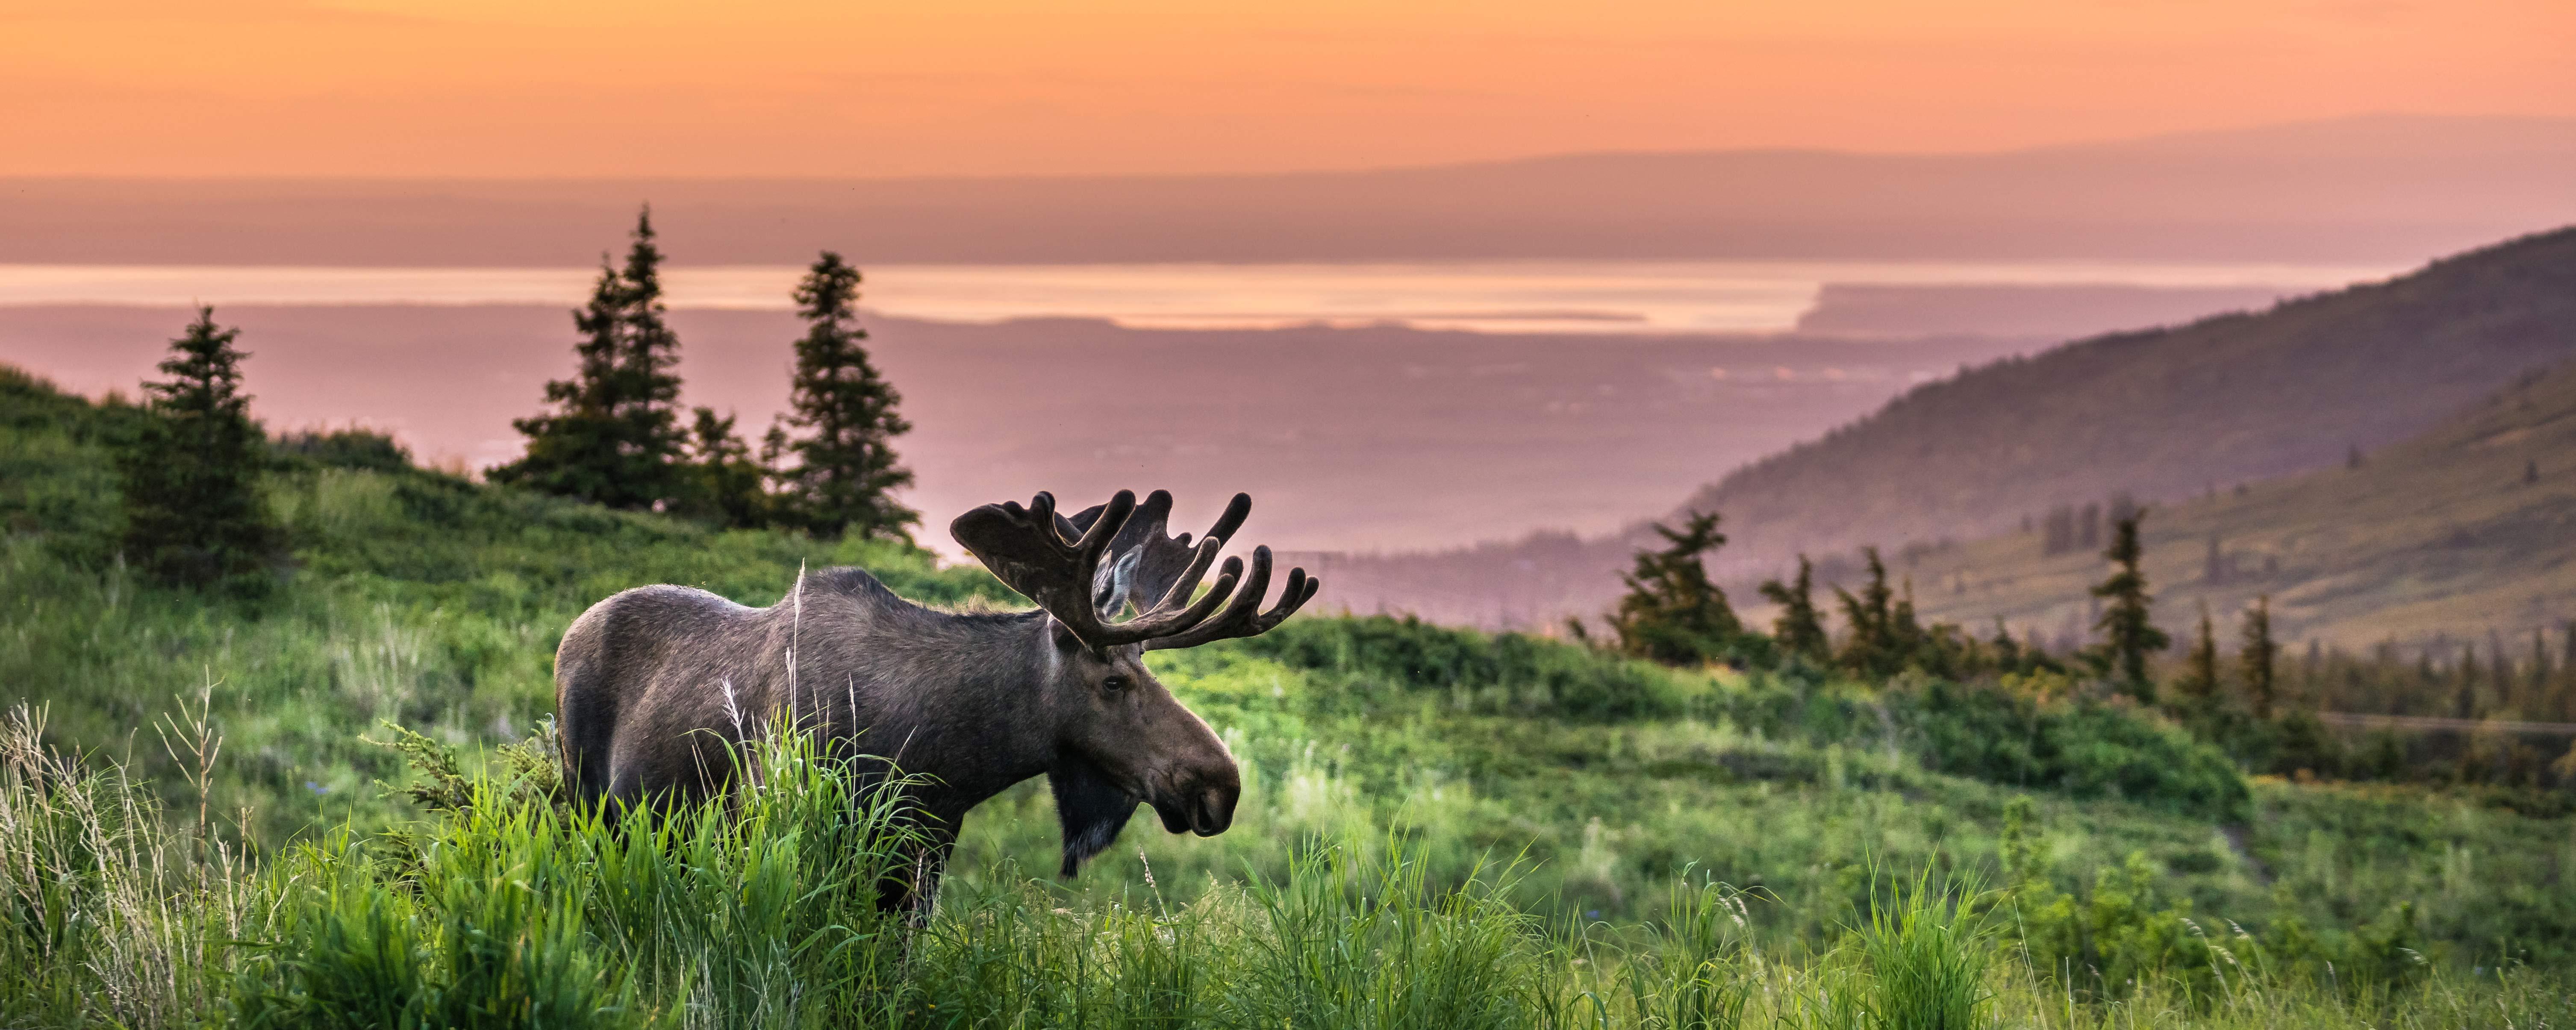 Moose in Anchorage | Visit Anchorage